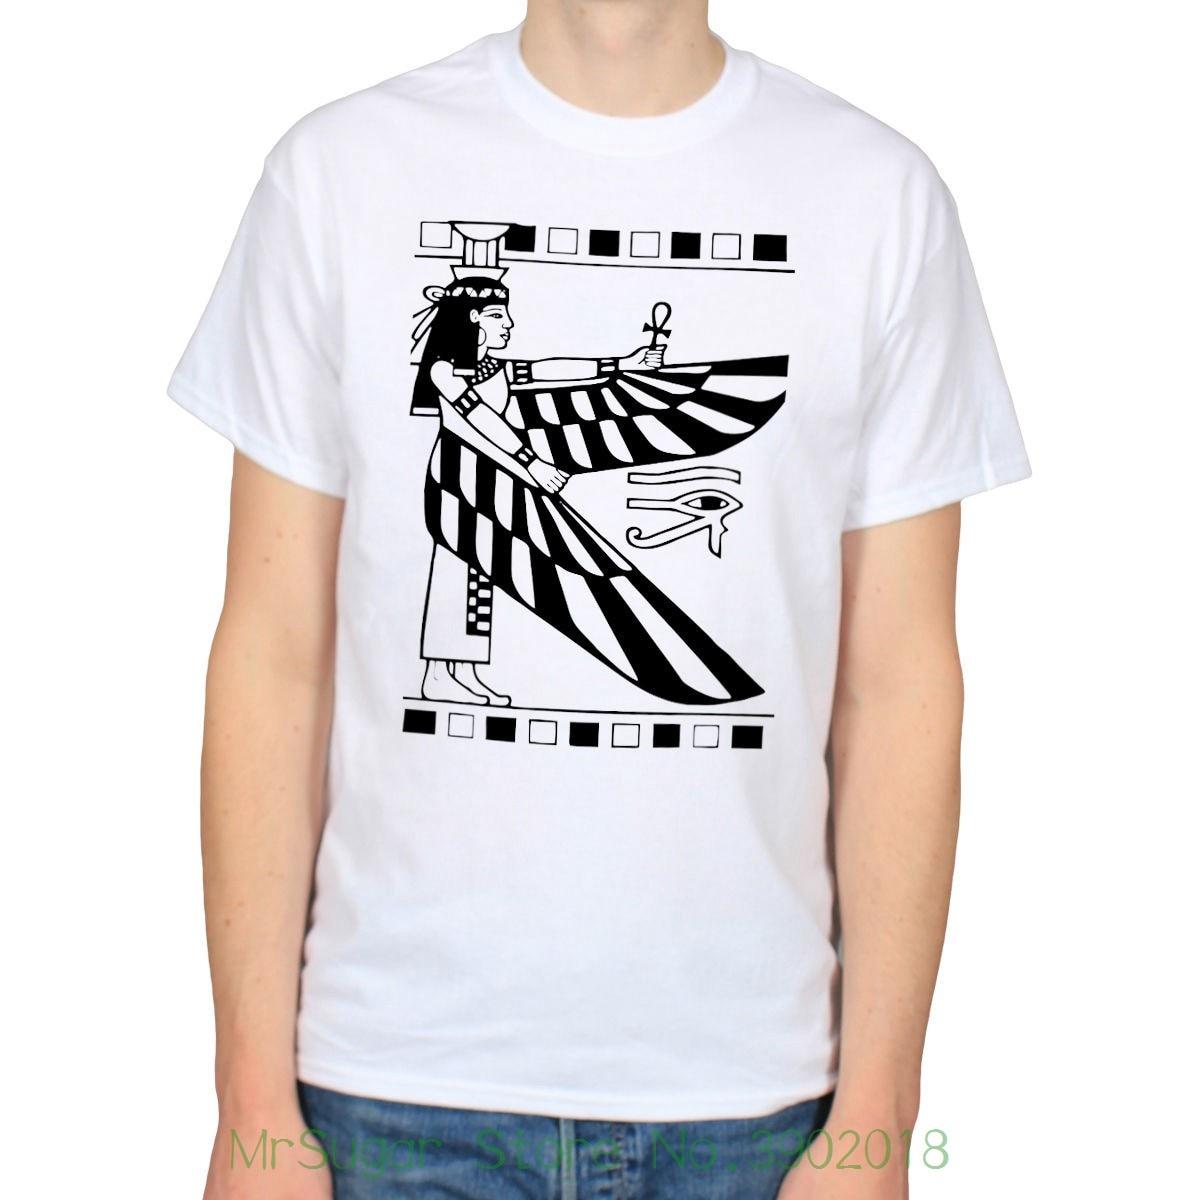 Egyptian Goddess Isis Ancient Egypt Empire Illuminati History T-shirt Tee Classic Tops Tee Shirts